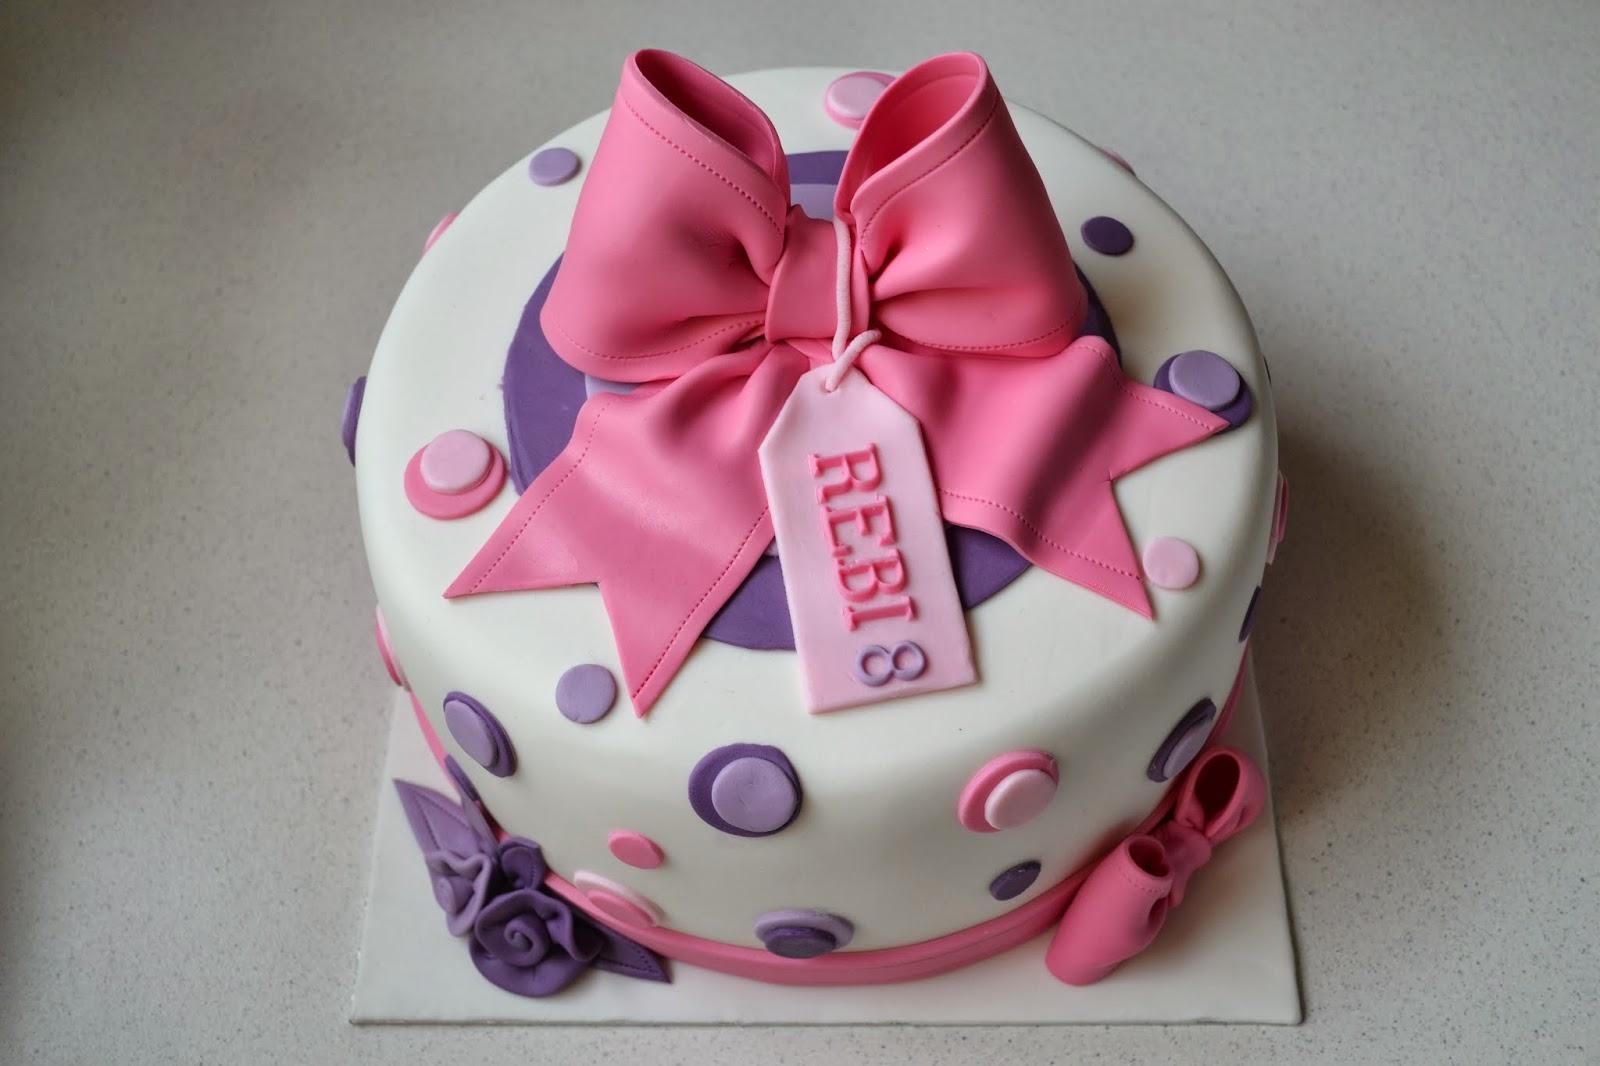 masnis torta képek Városi lány: Masnis torta masnis torta képek